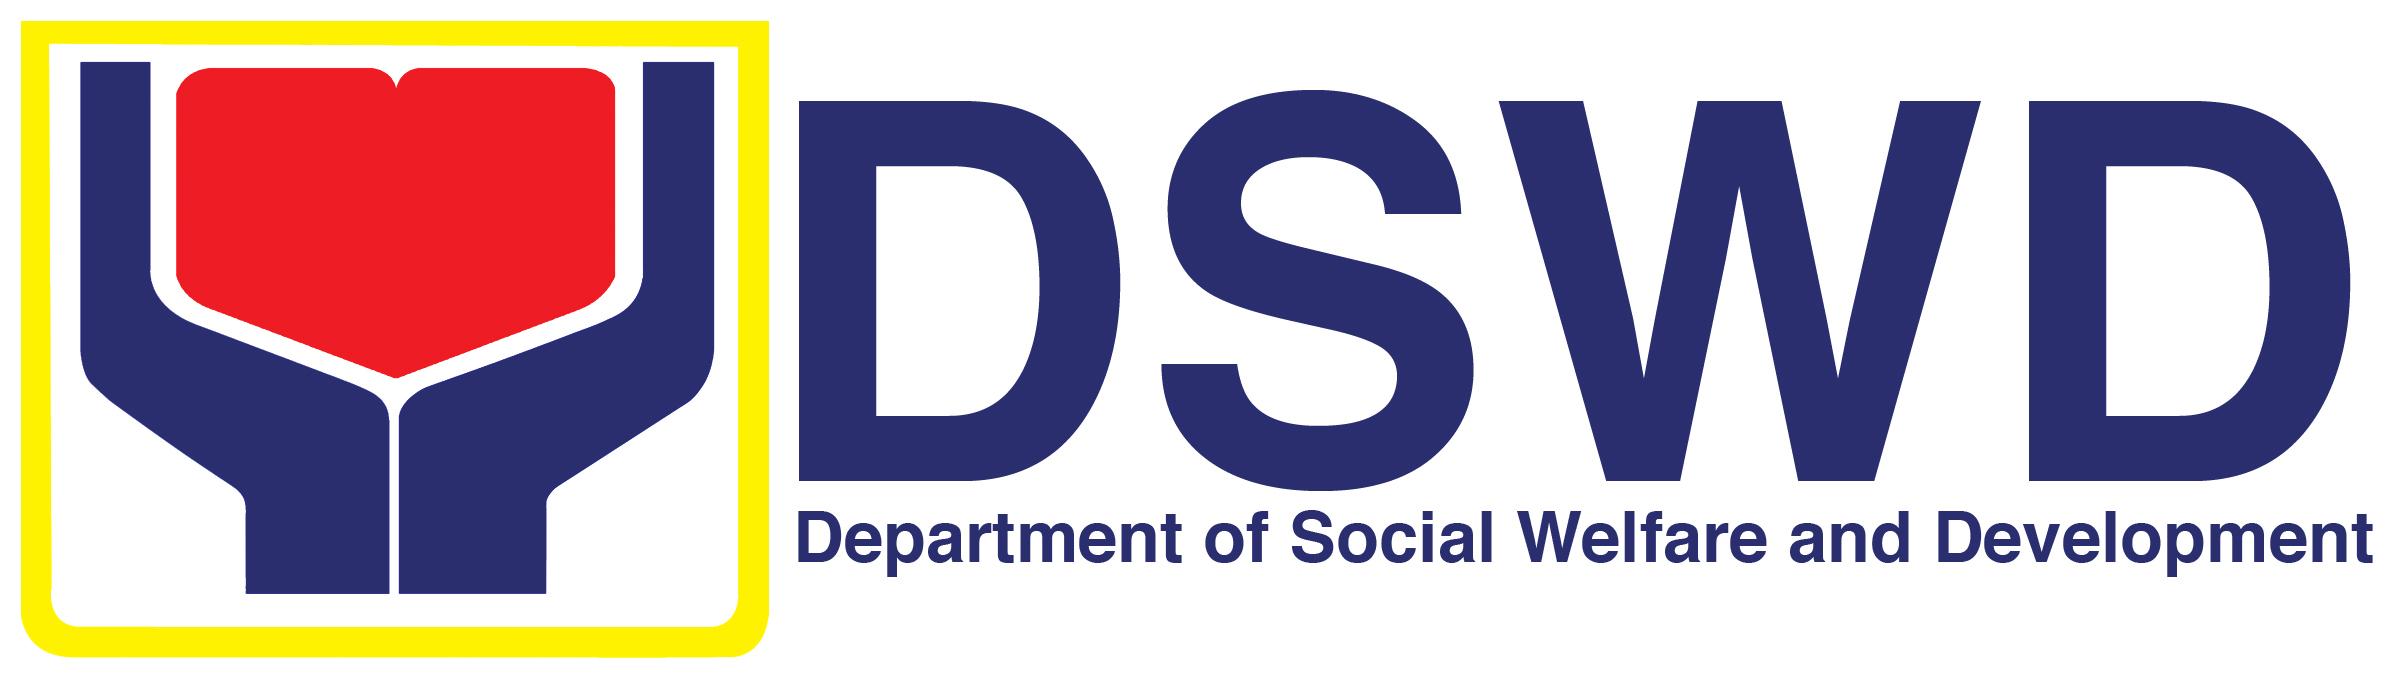 dswd_logo.jpg